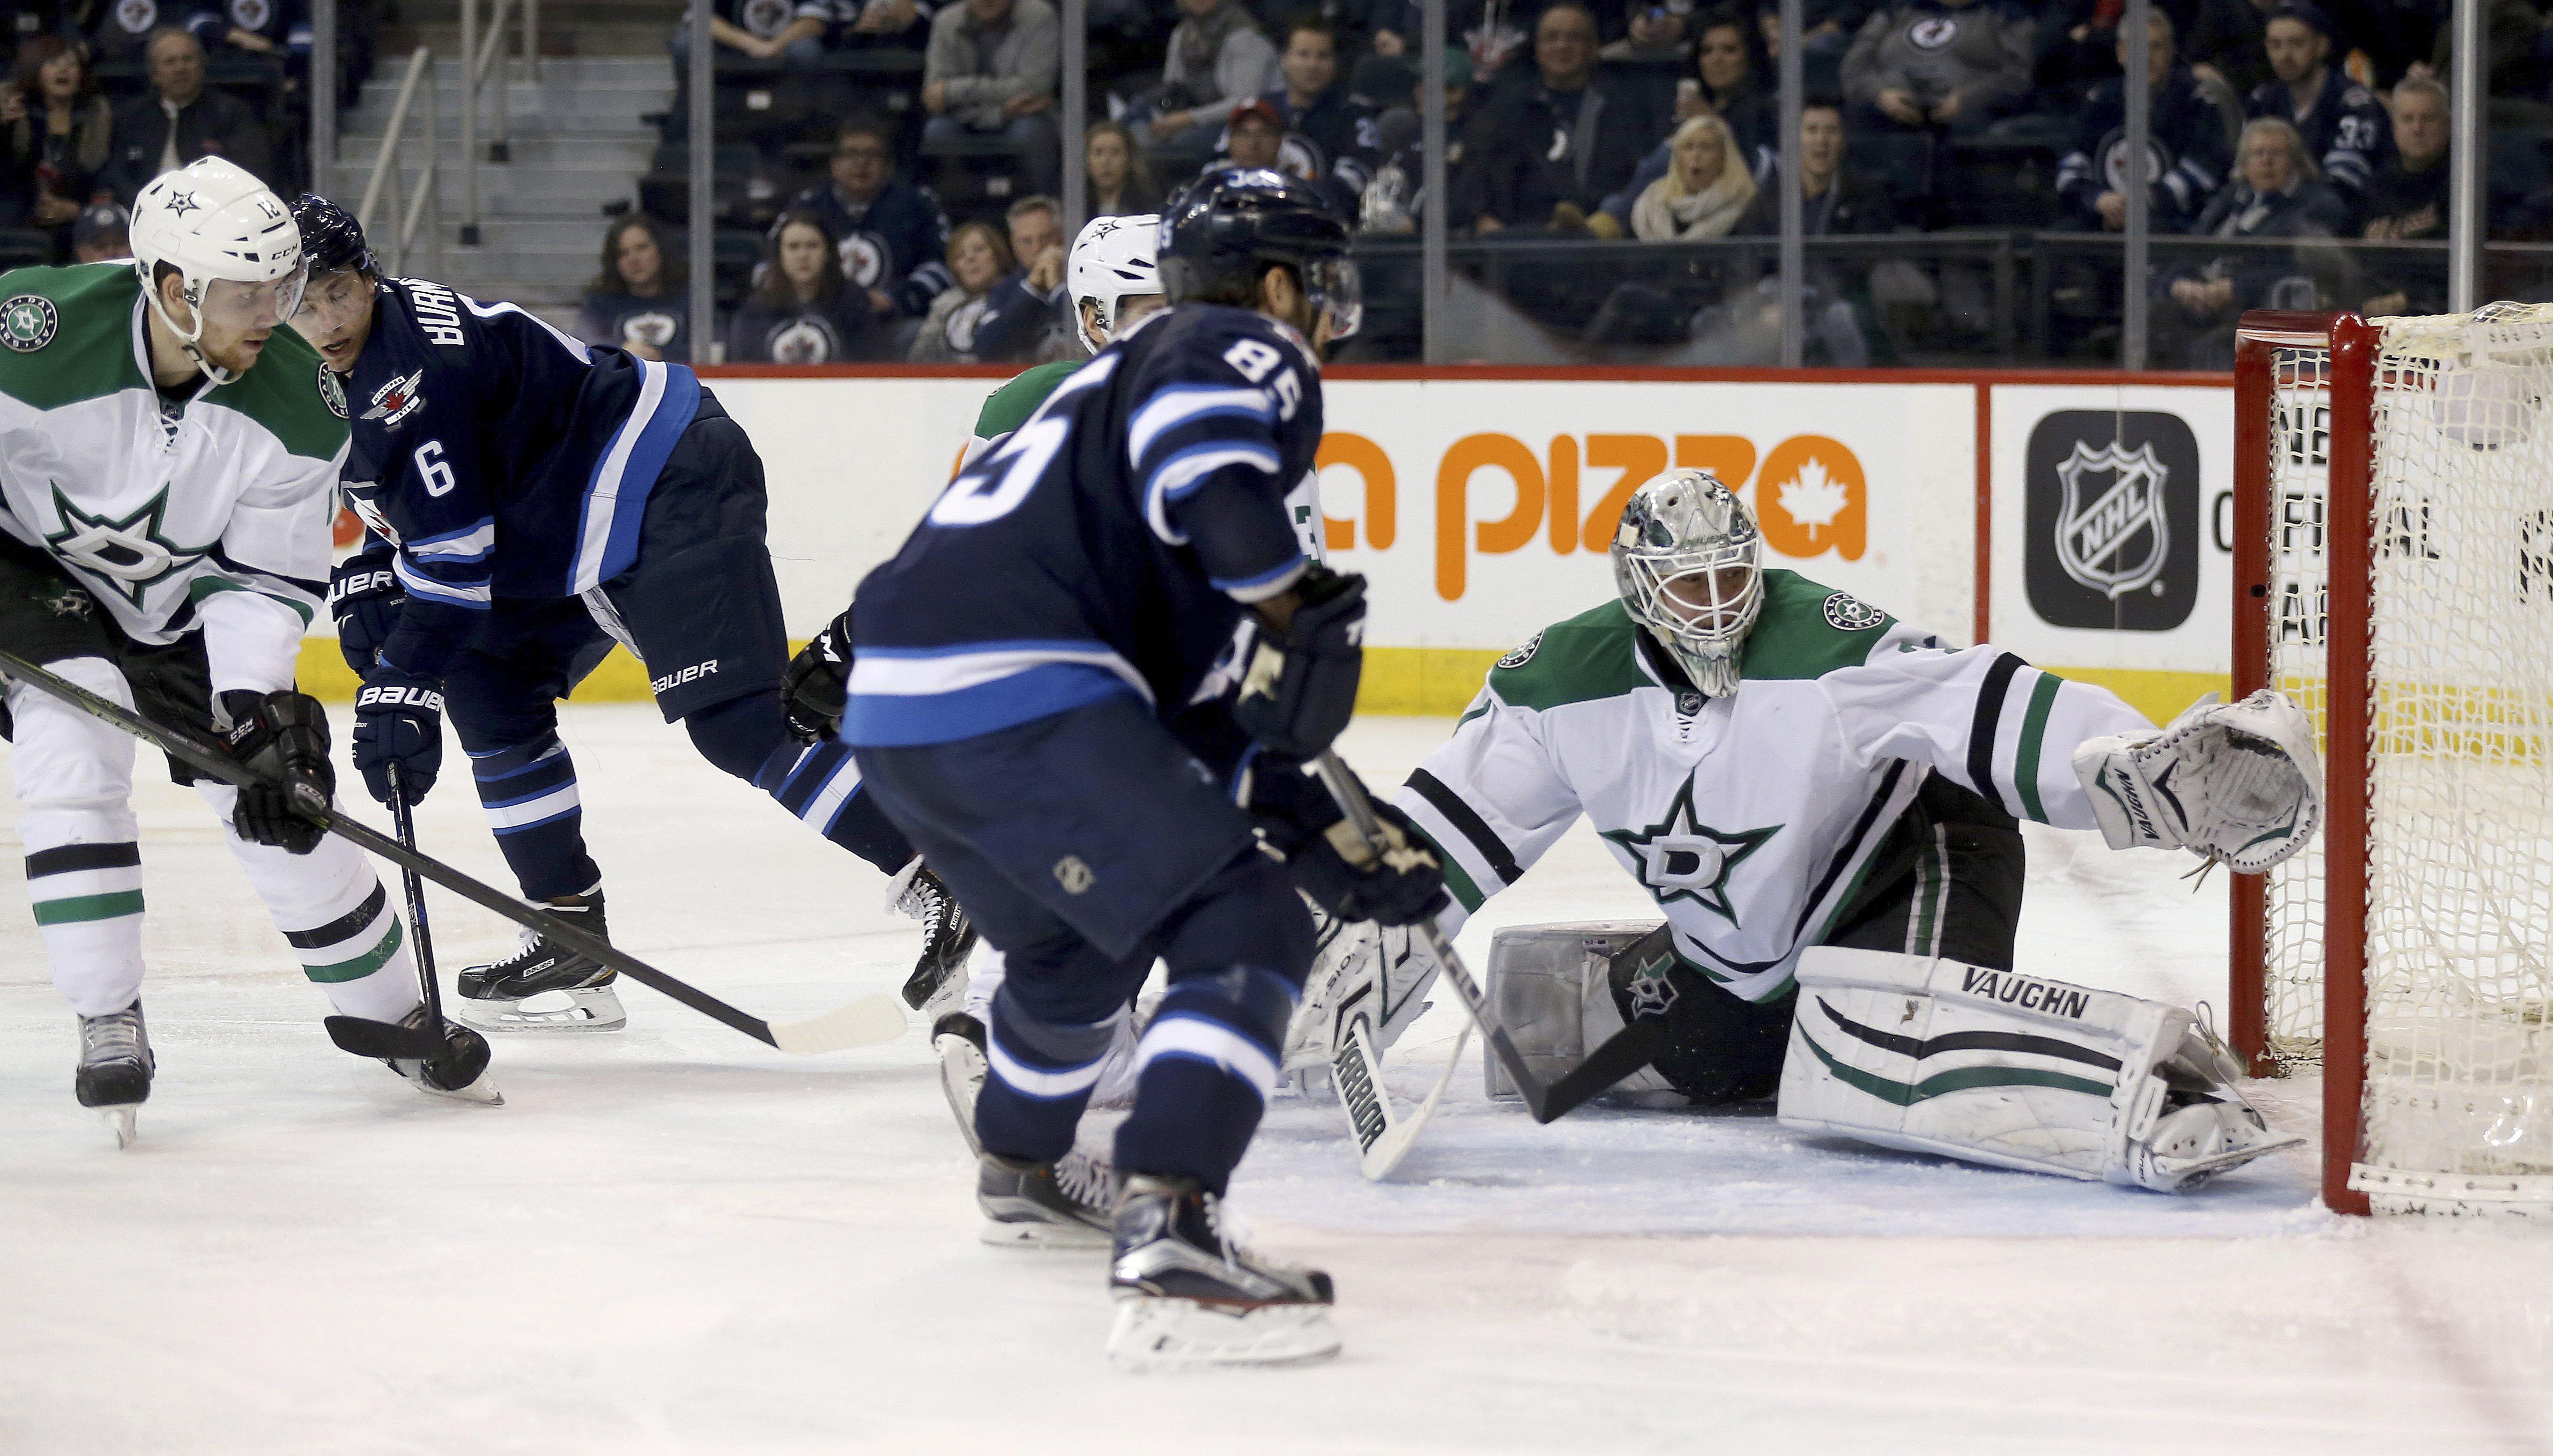 Winnipeg Jets' Alexander Burmistrov (6) scores on Dallas Stars goaltender Antti Niemi (31) during the second period of an NHL hockey game Tuesday, Feb. 23, 2016, in Winnipeg, Manitoba. (Trevor Hagan/The Canadian Press via AP)